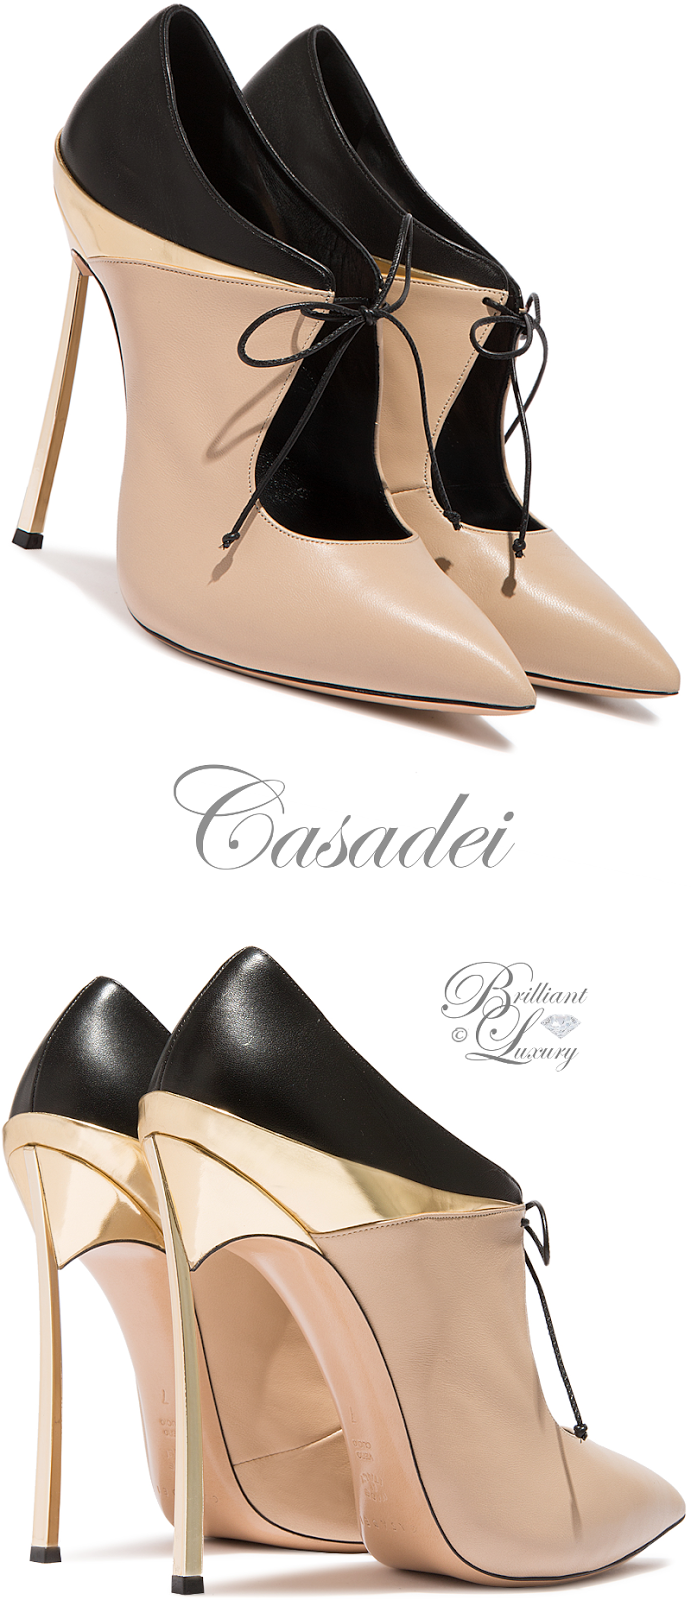 Brilliant Luxury ♢ Casadei  Blade  FW 2016 2339213a273